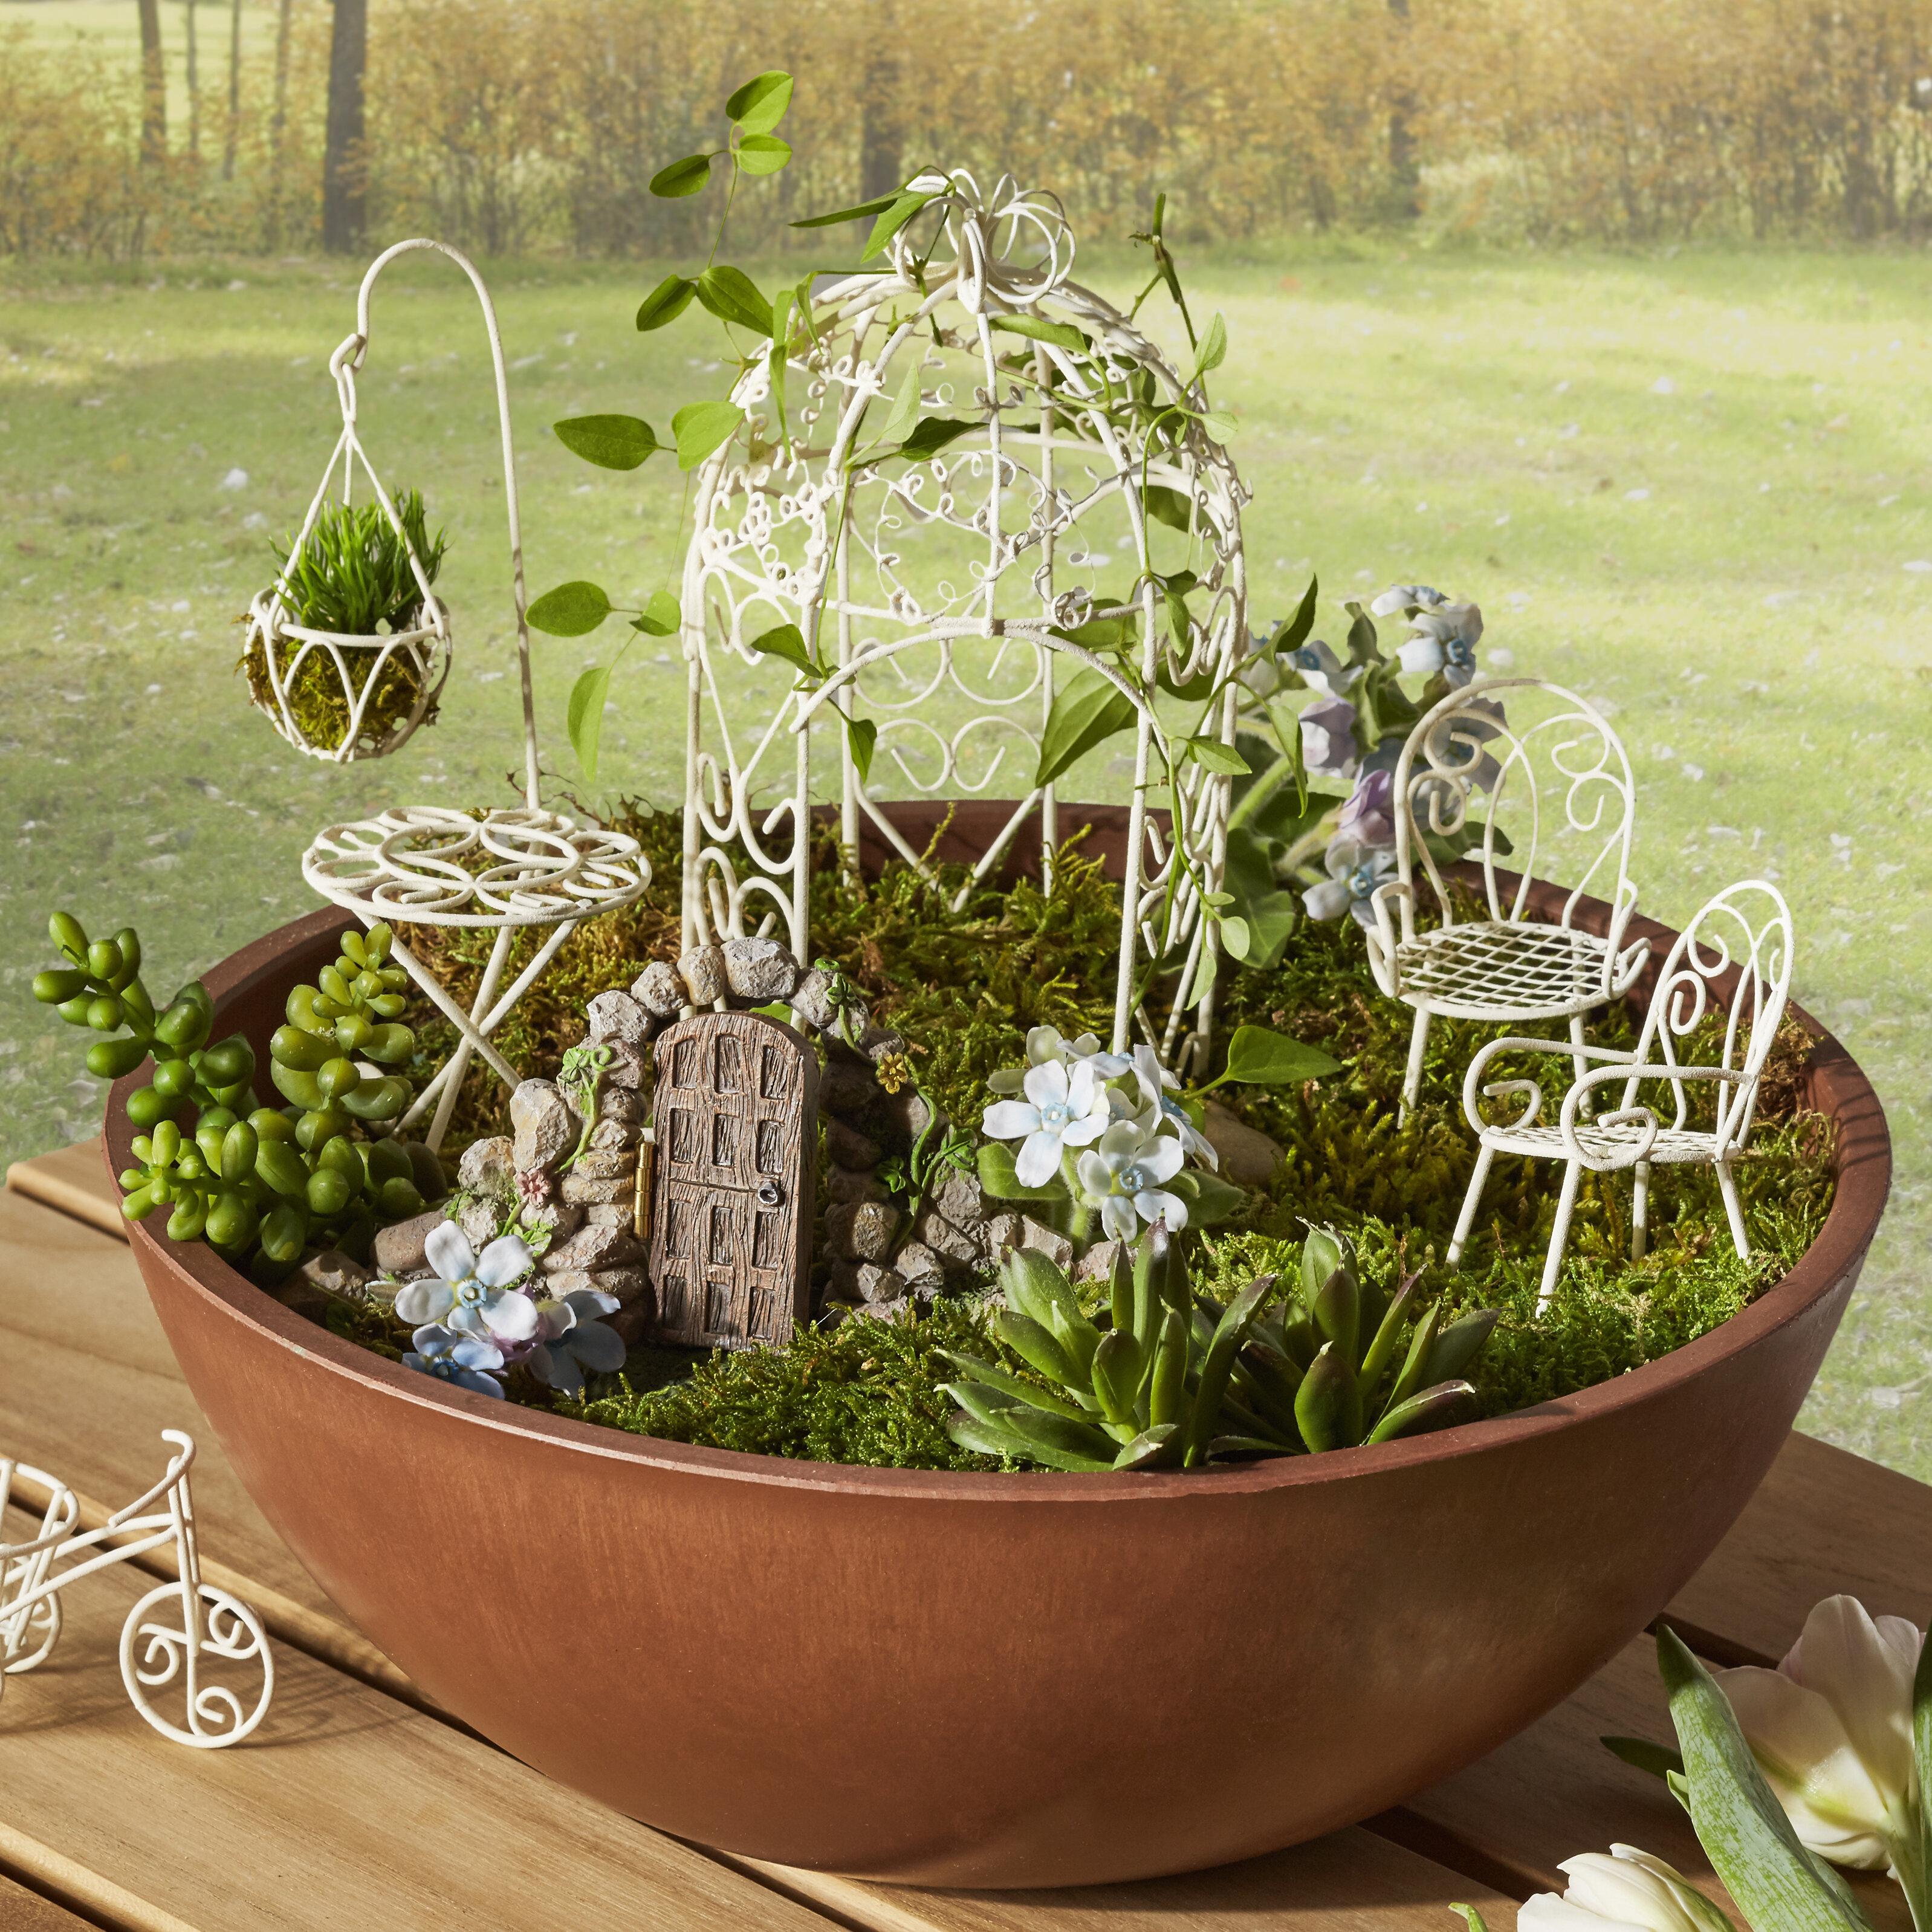 Fairy Garden 1 to 4 inches tall for Miniature Garden 15 Piece Set Pine Trees